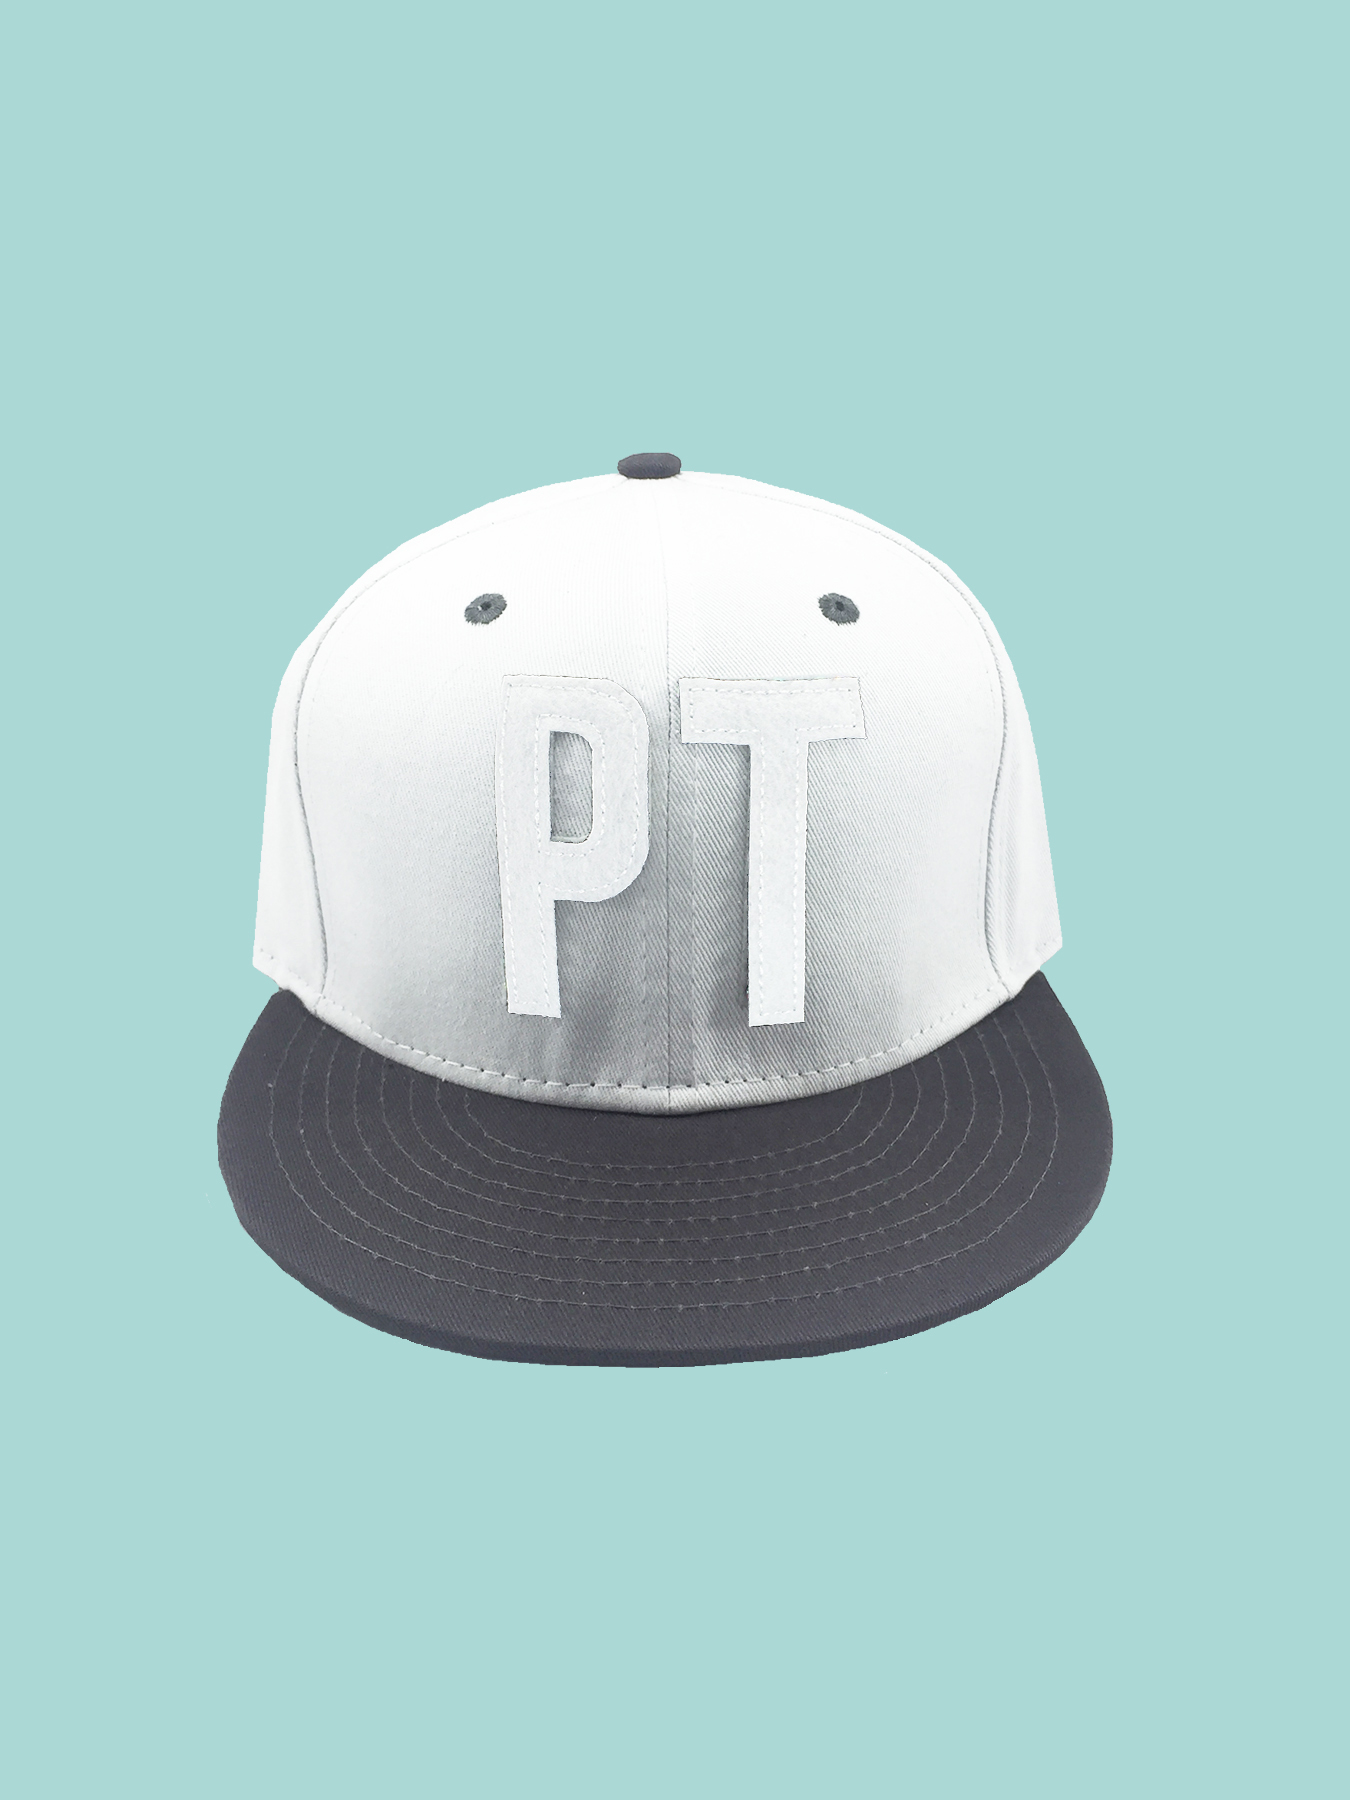 BASEBALL HAT: White Ptown Hat